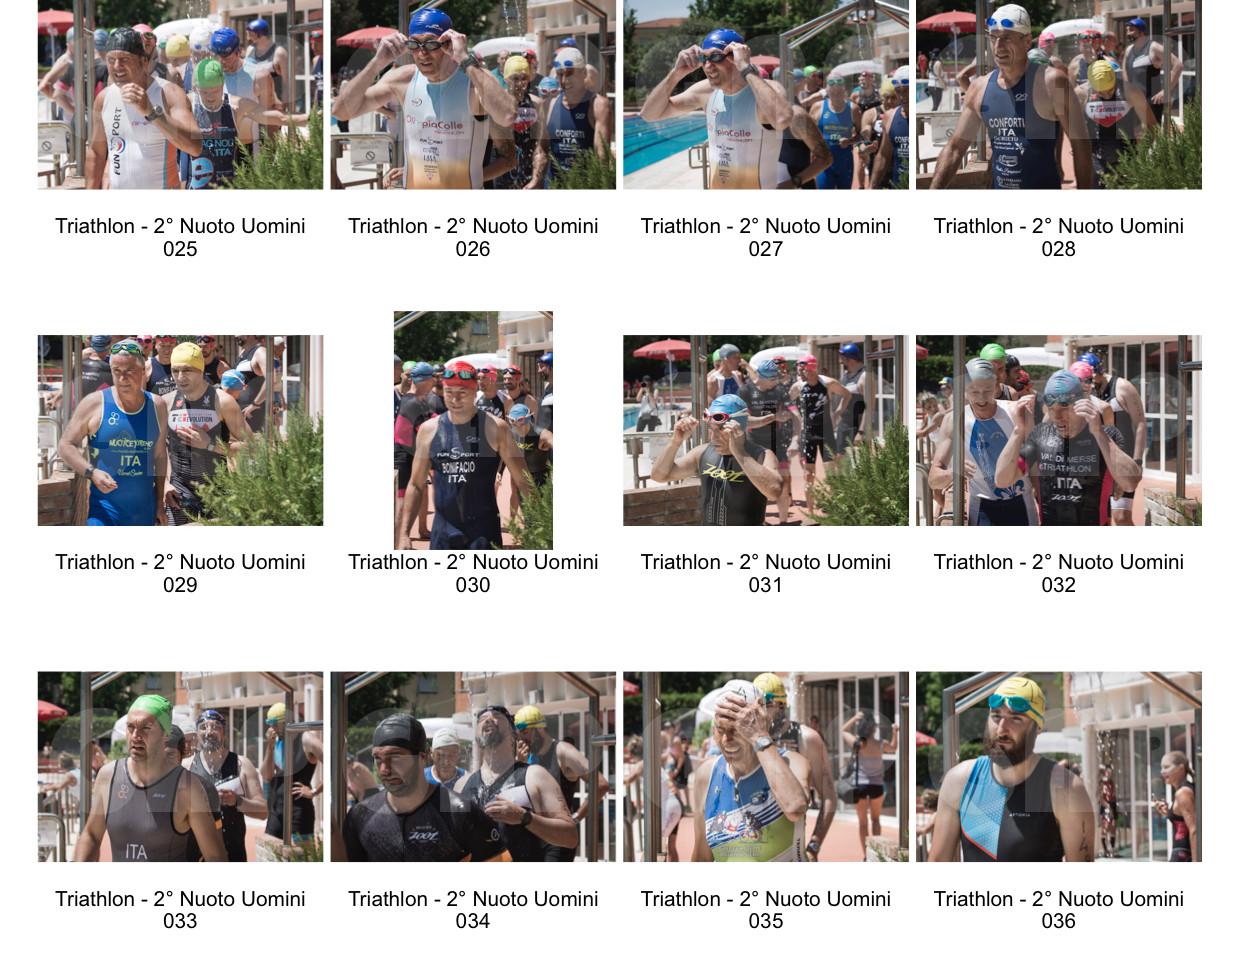 Triathlon_V.Elsa_-_2°_Frazione_Nuoto_Uomini_-2.jpg